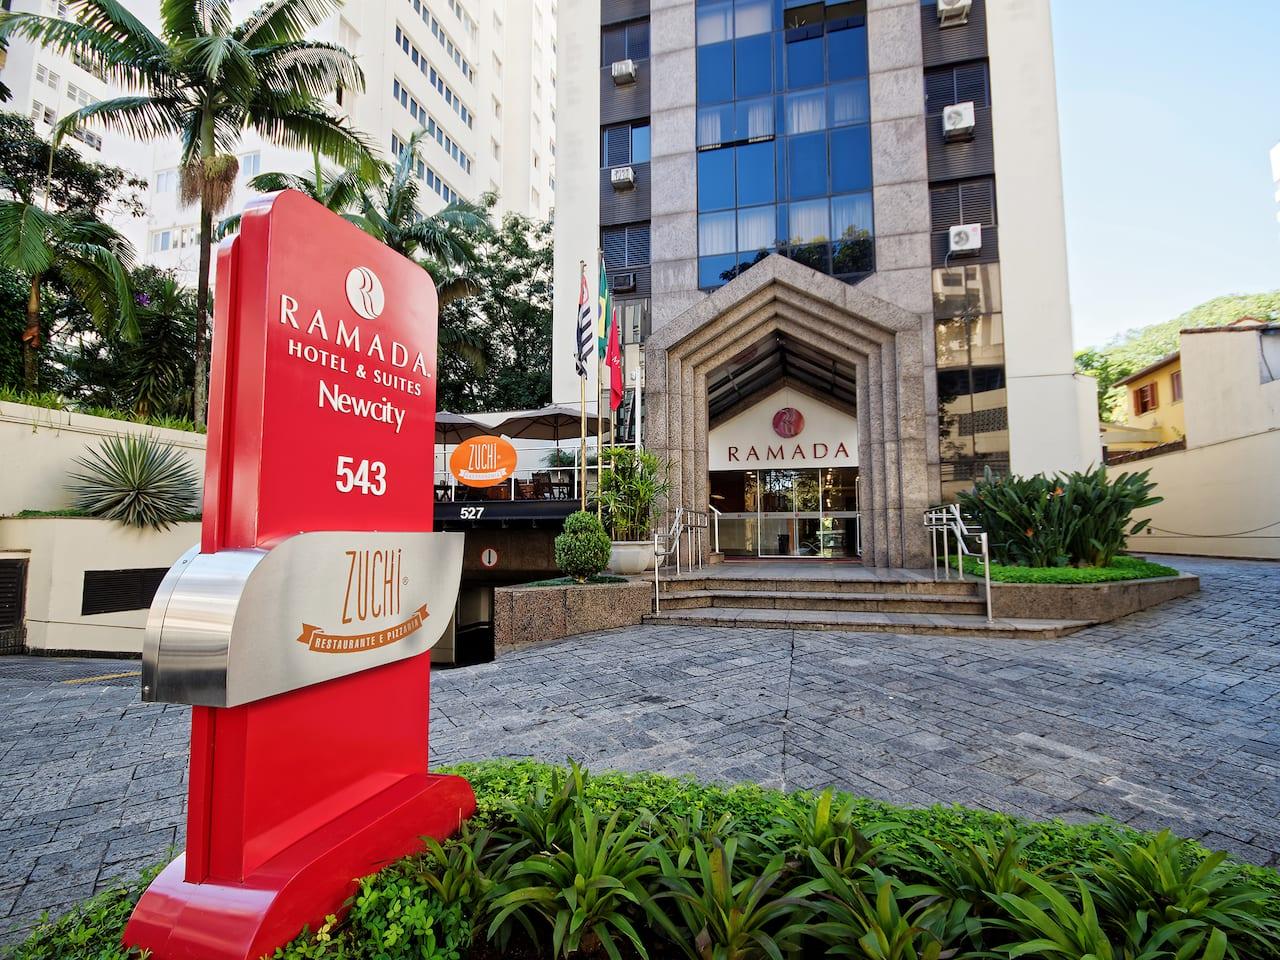 Ramada Suites Sao Paulo Itaim Bibi Newciti en Guarulhos, BRASIL